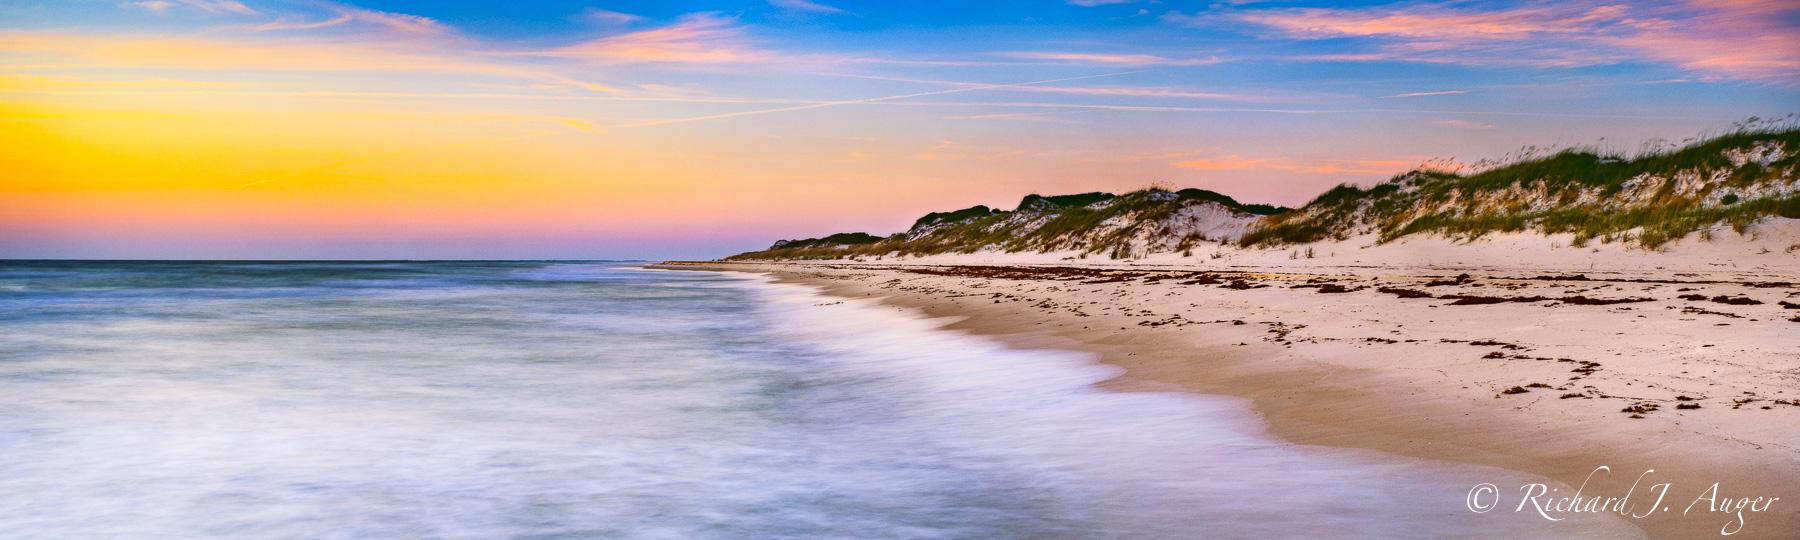 Cape San Blas, Florida, Beach, Sunset, Sunrise, Panorama, Panoramic, Photograph